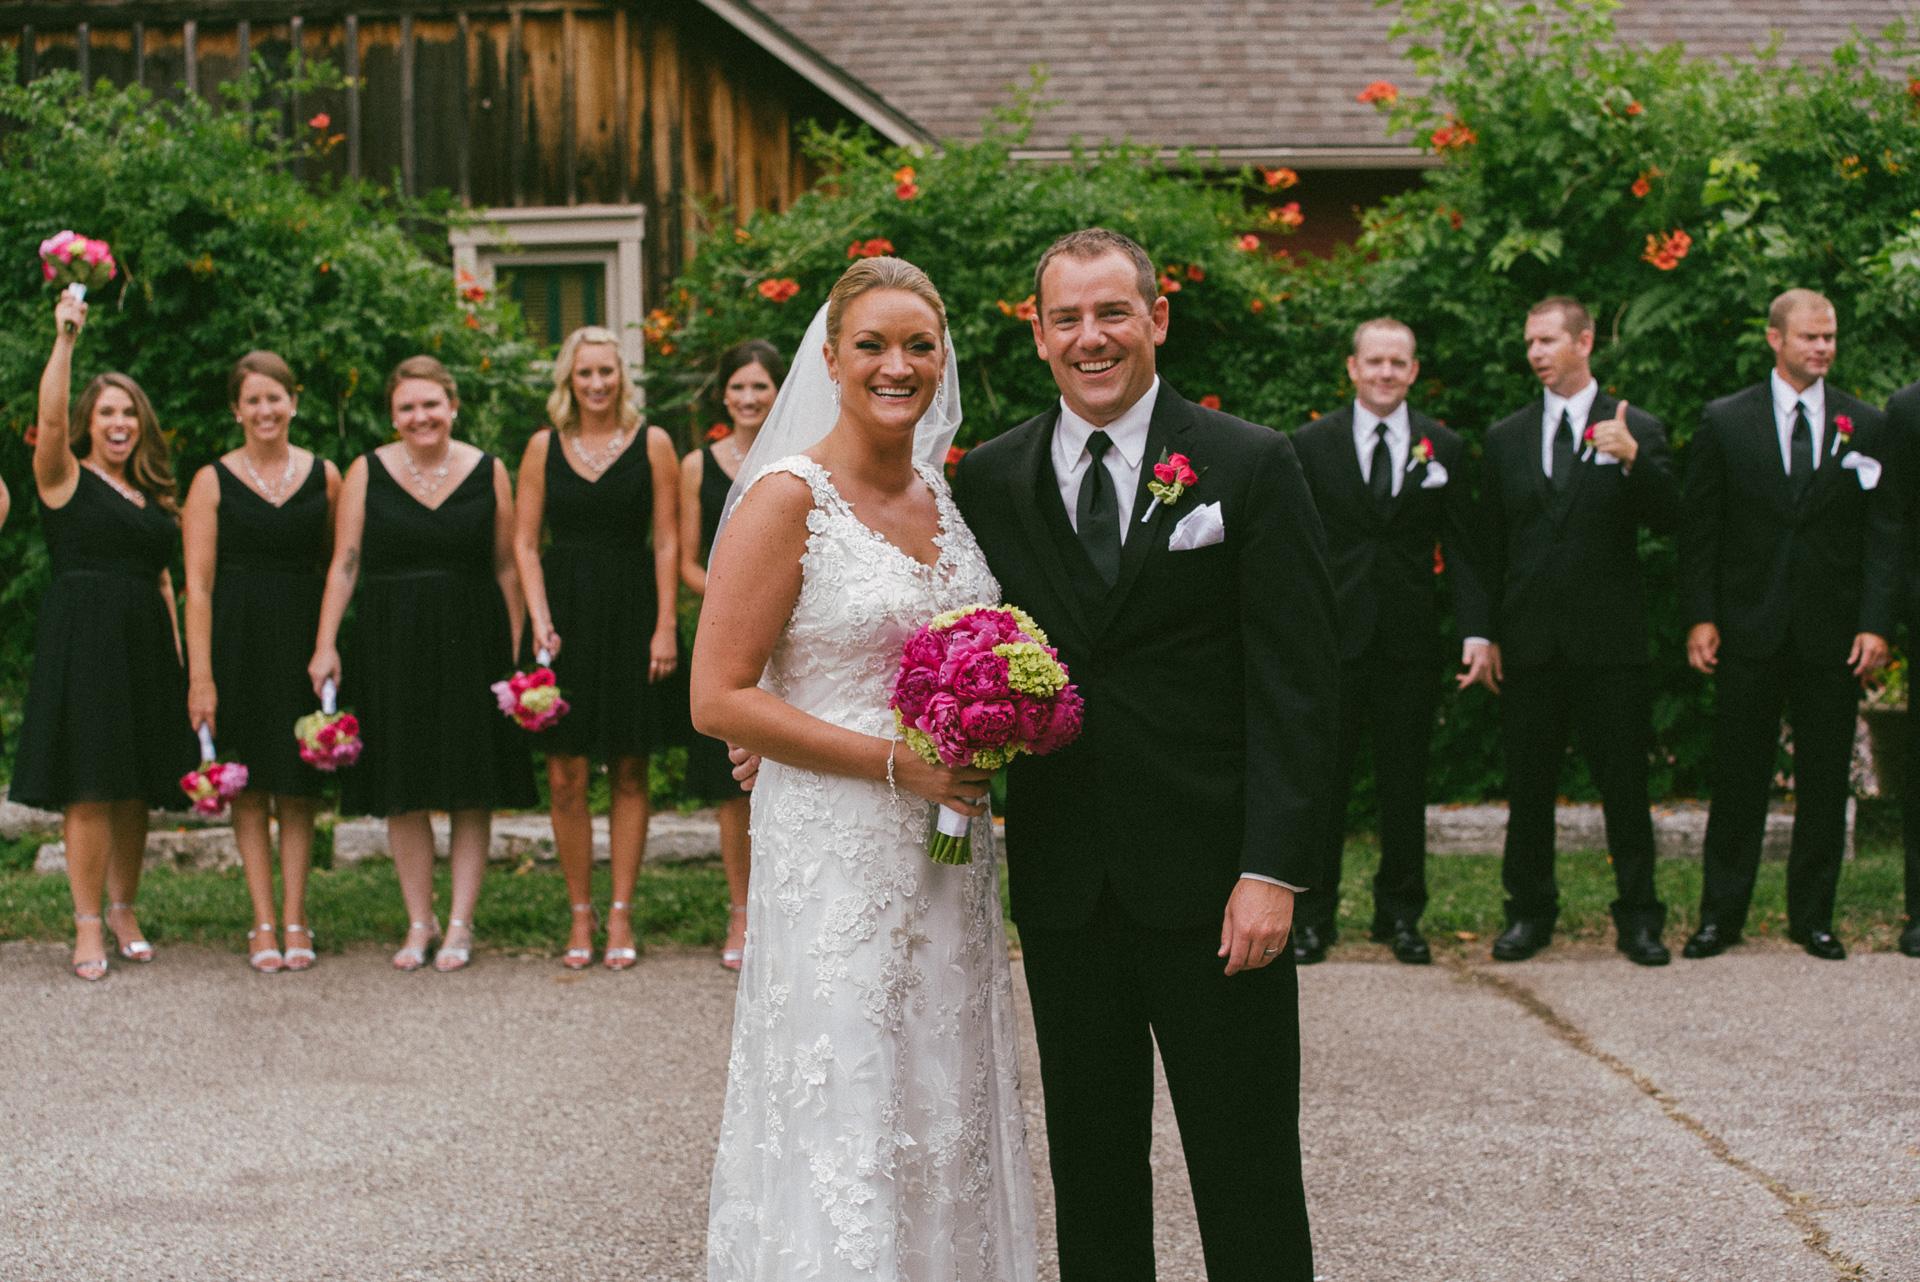 Dayton Wedding Photographer - Wedding Party